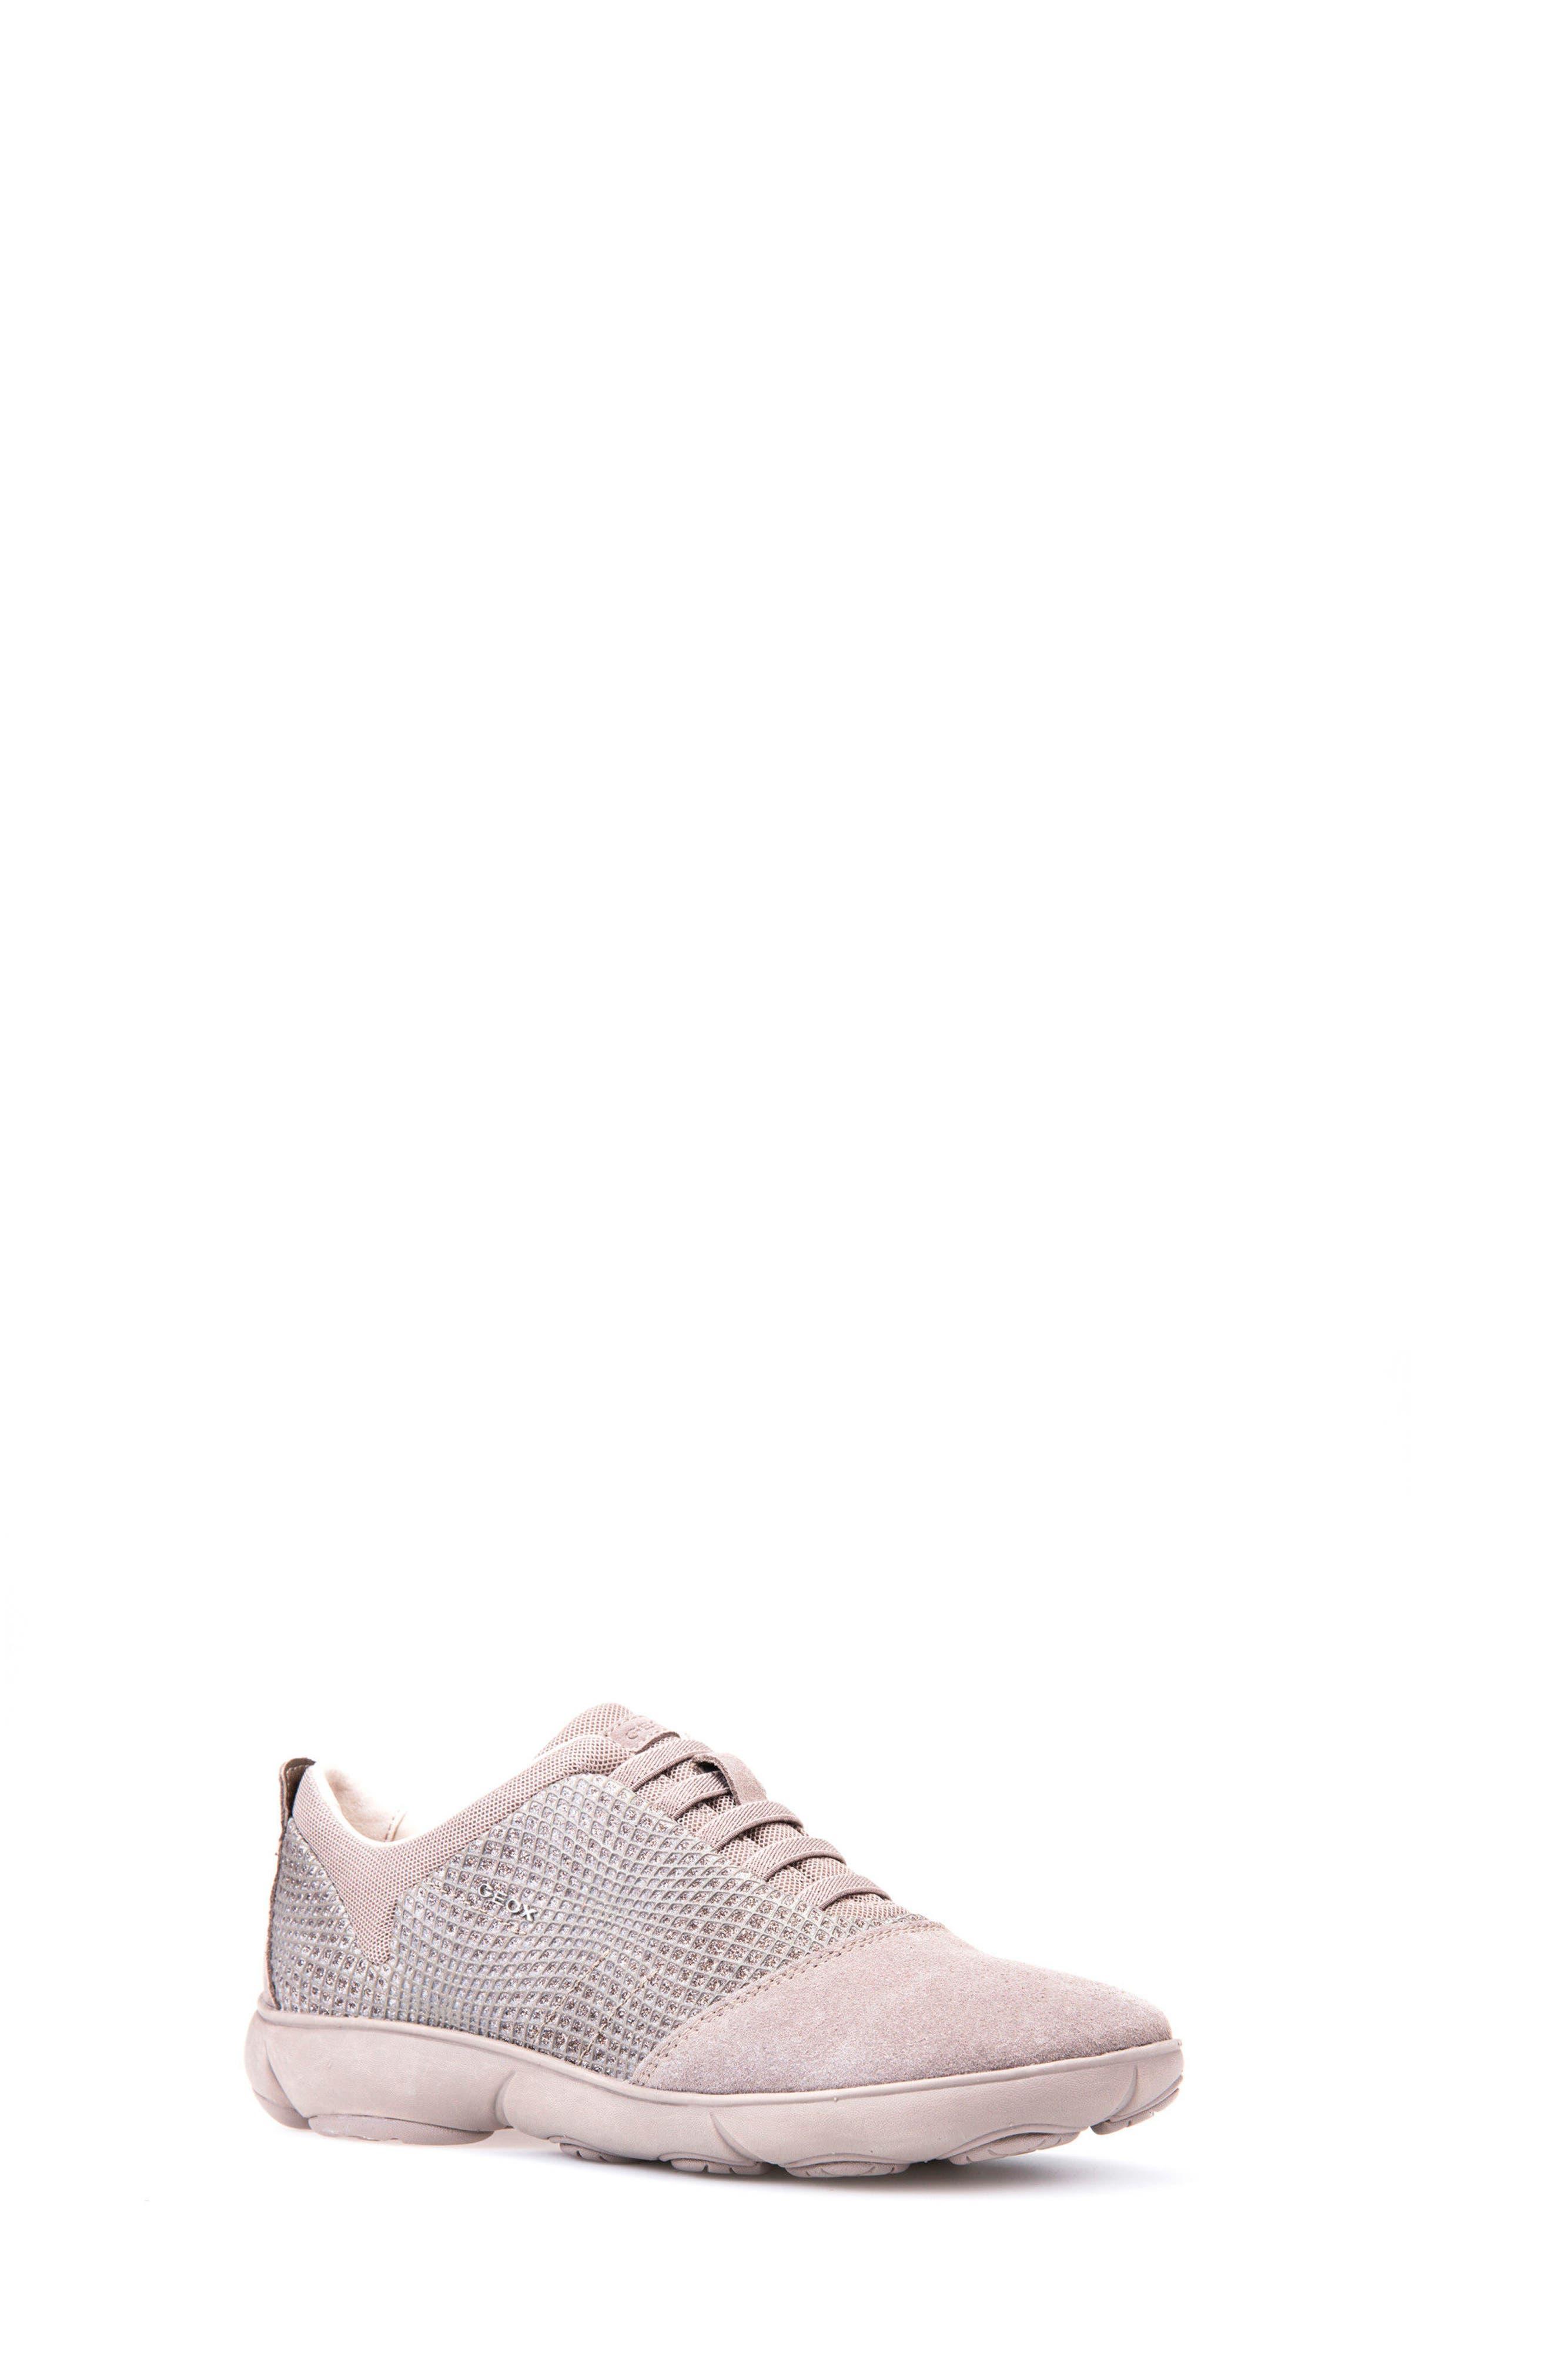 Nebula Slip-On Sneaker,                             Main thumbnail 3, color,